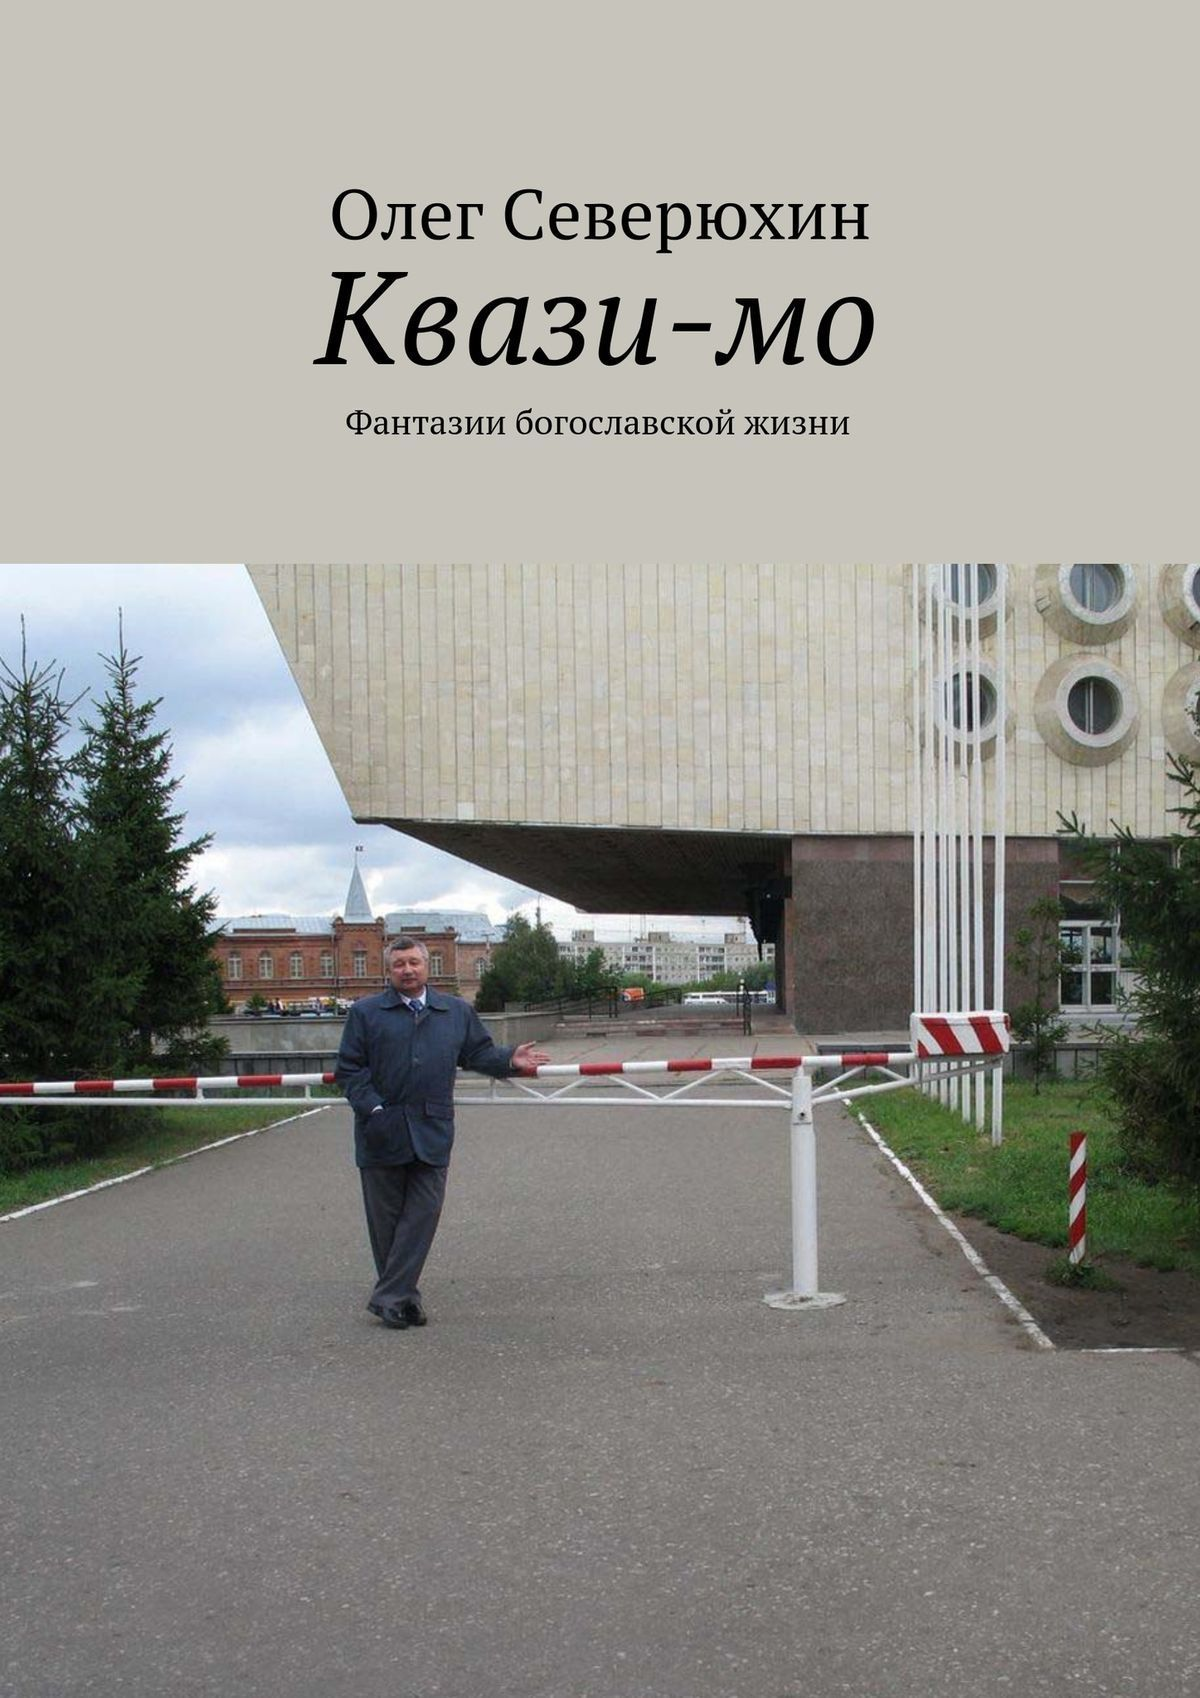 Олег Васильевич Северюхин Квази-мо. Фантазии богославской жизни ISBN: 9785447414214